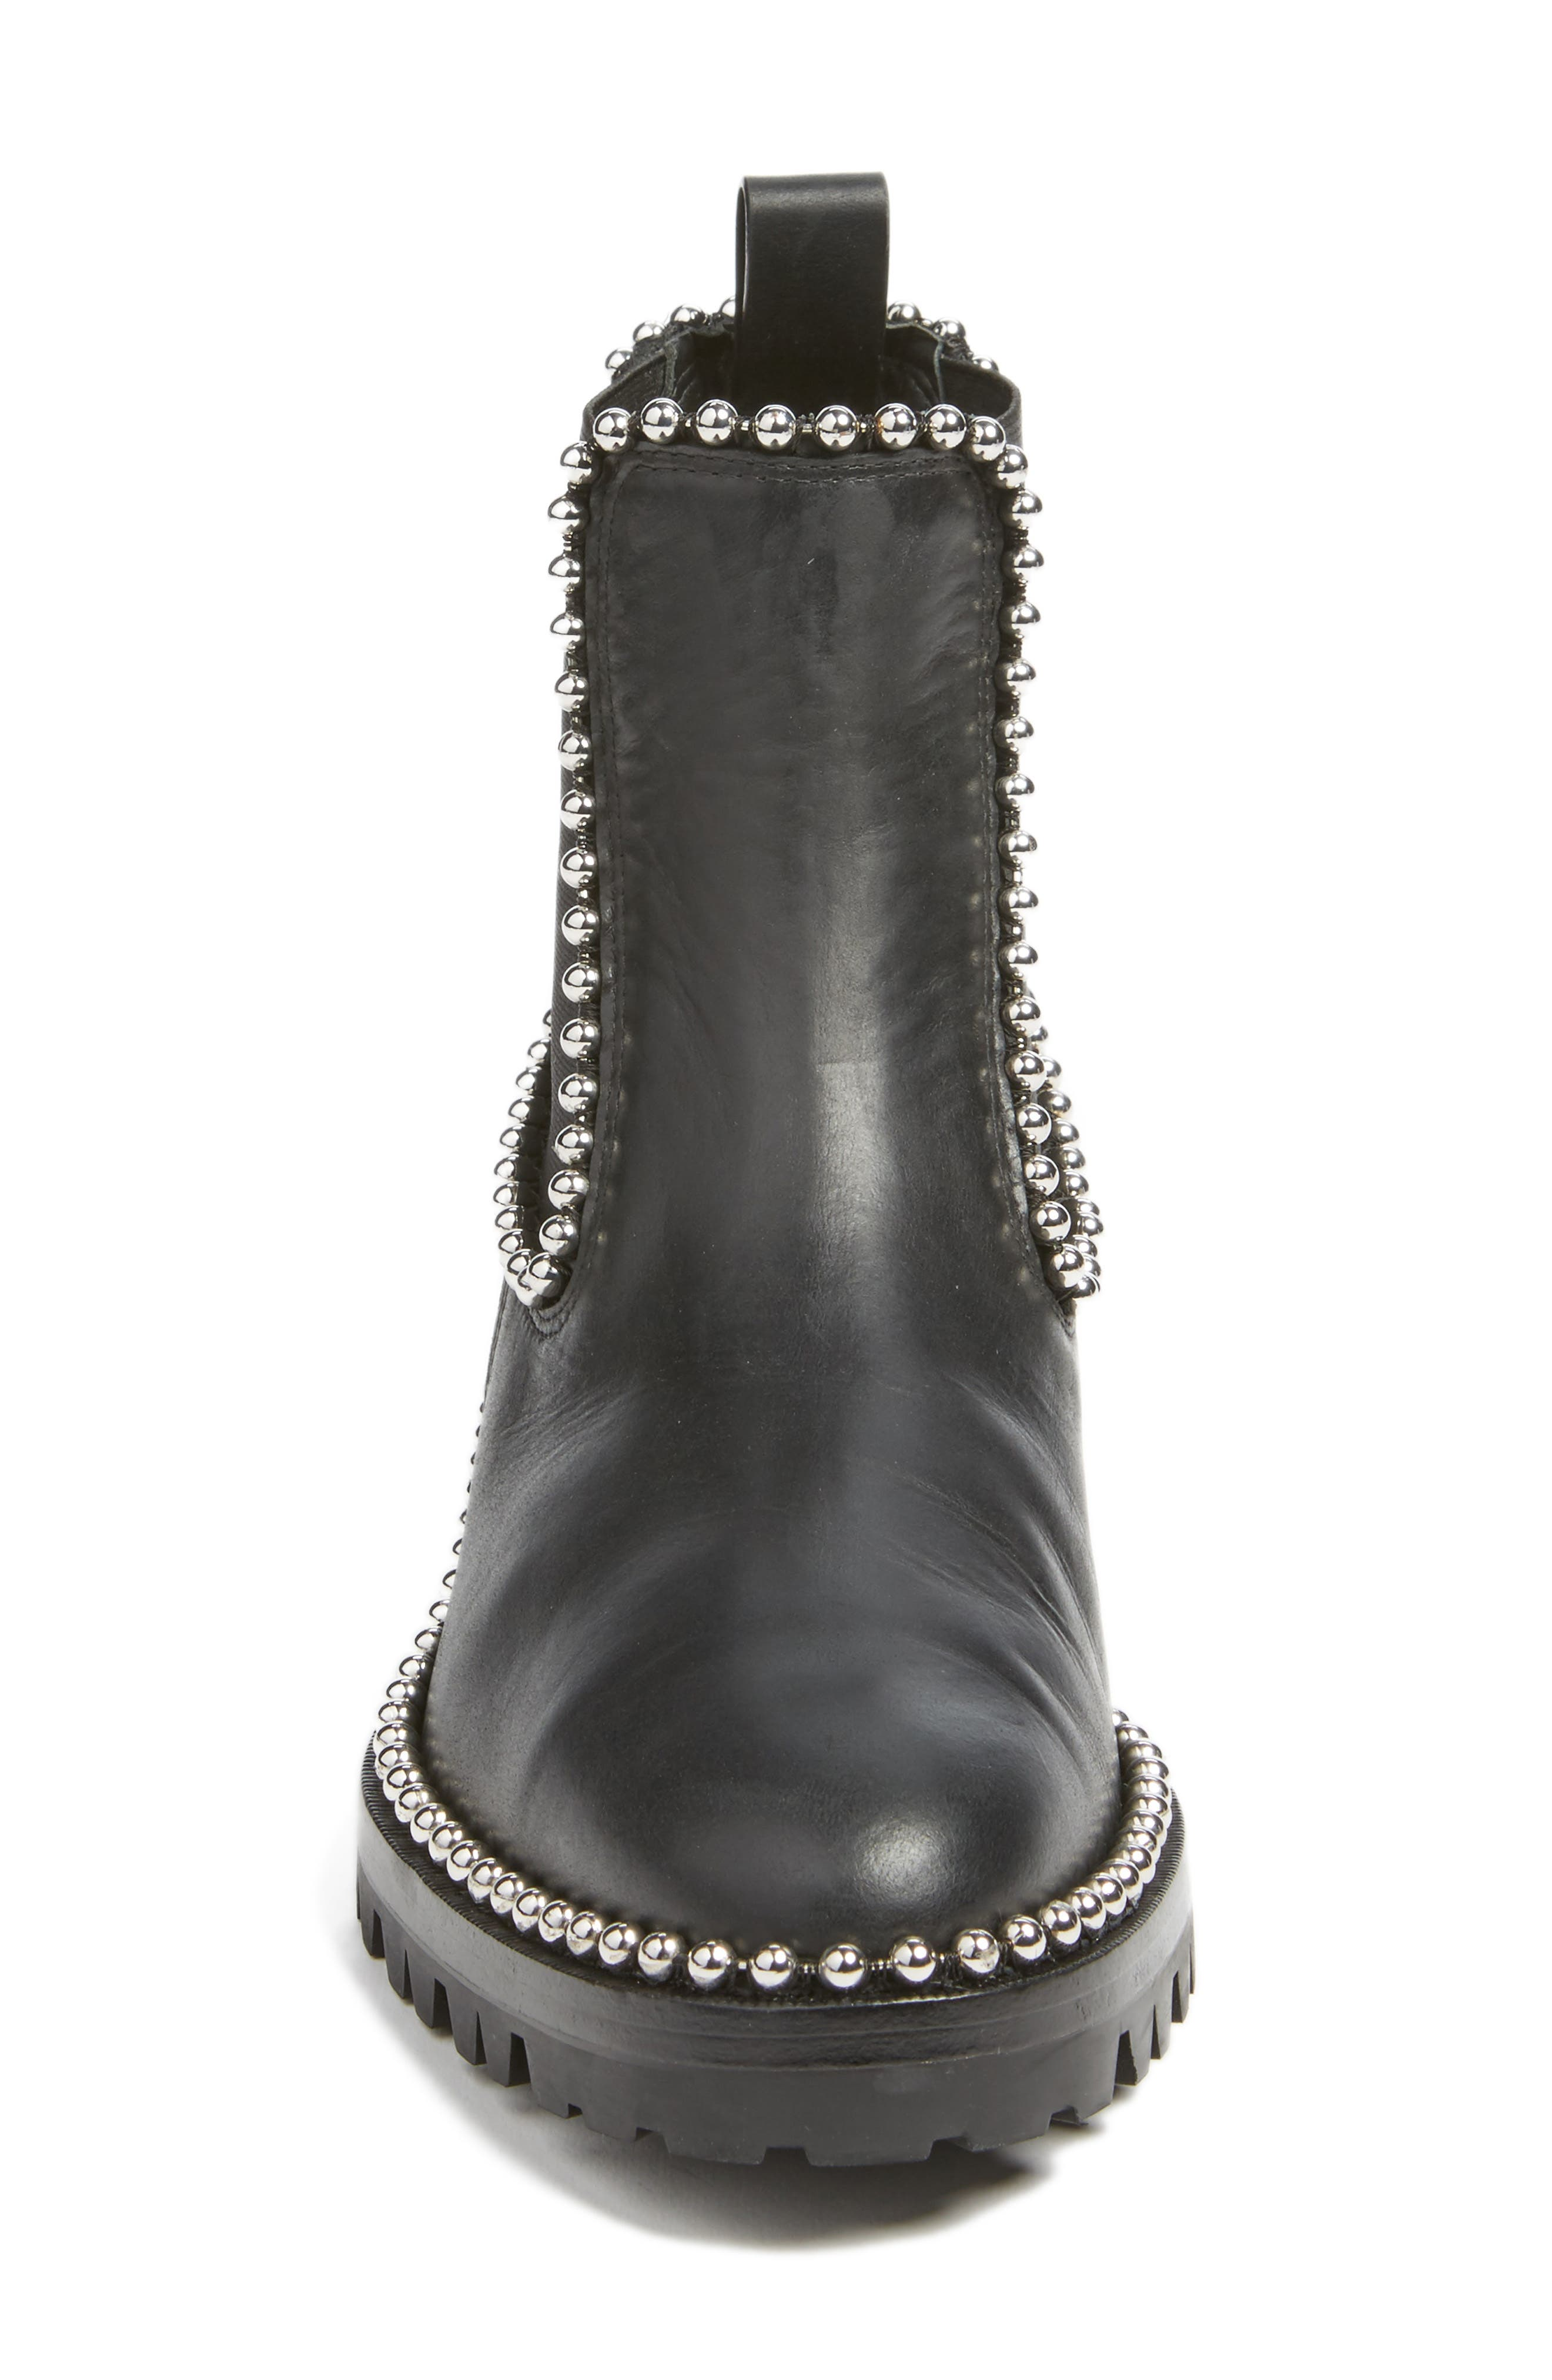 Spencer Chelsea Boot,                             Alternate thumbnail 4, color,                             BLACK LEATHER